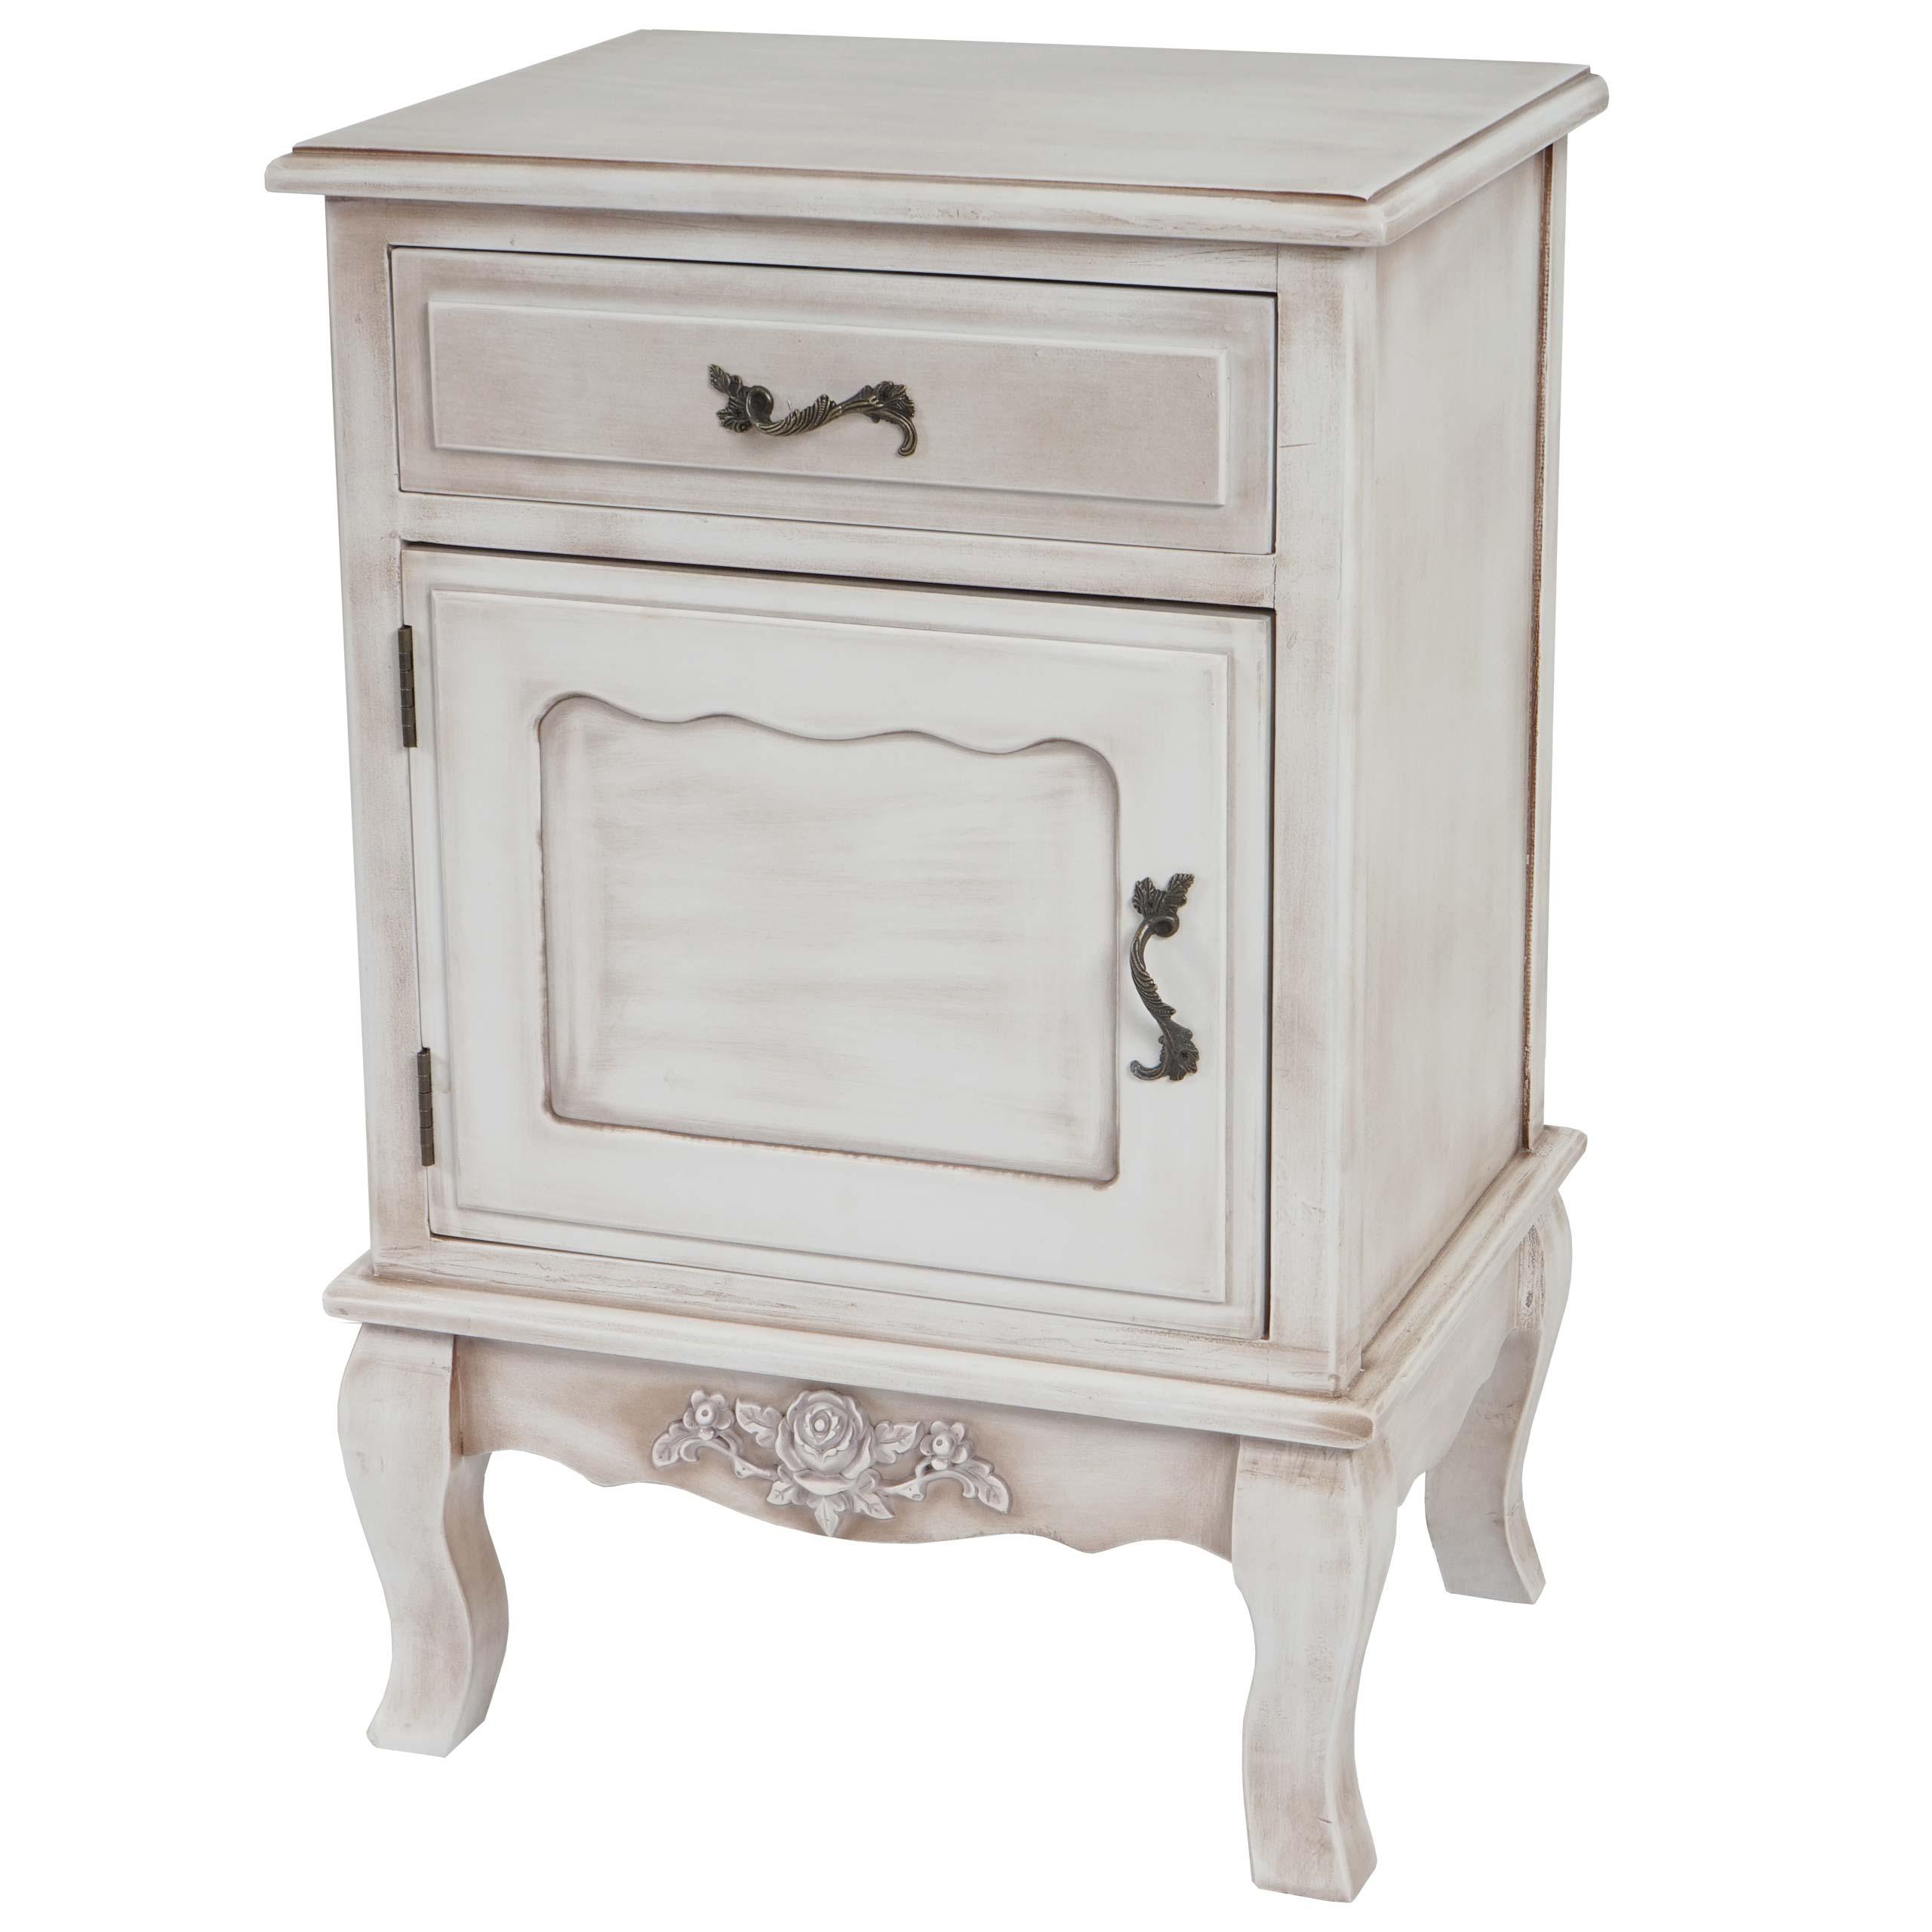 kommode valence h432 barock antik 69x46x36cm wei antik. Black Bedroom Furniture Sets. Home Design Ideas